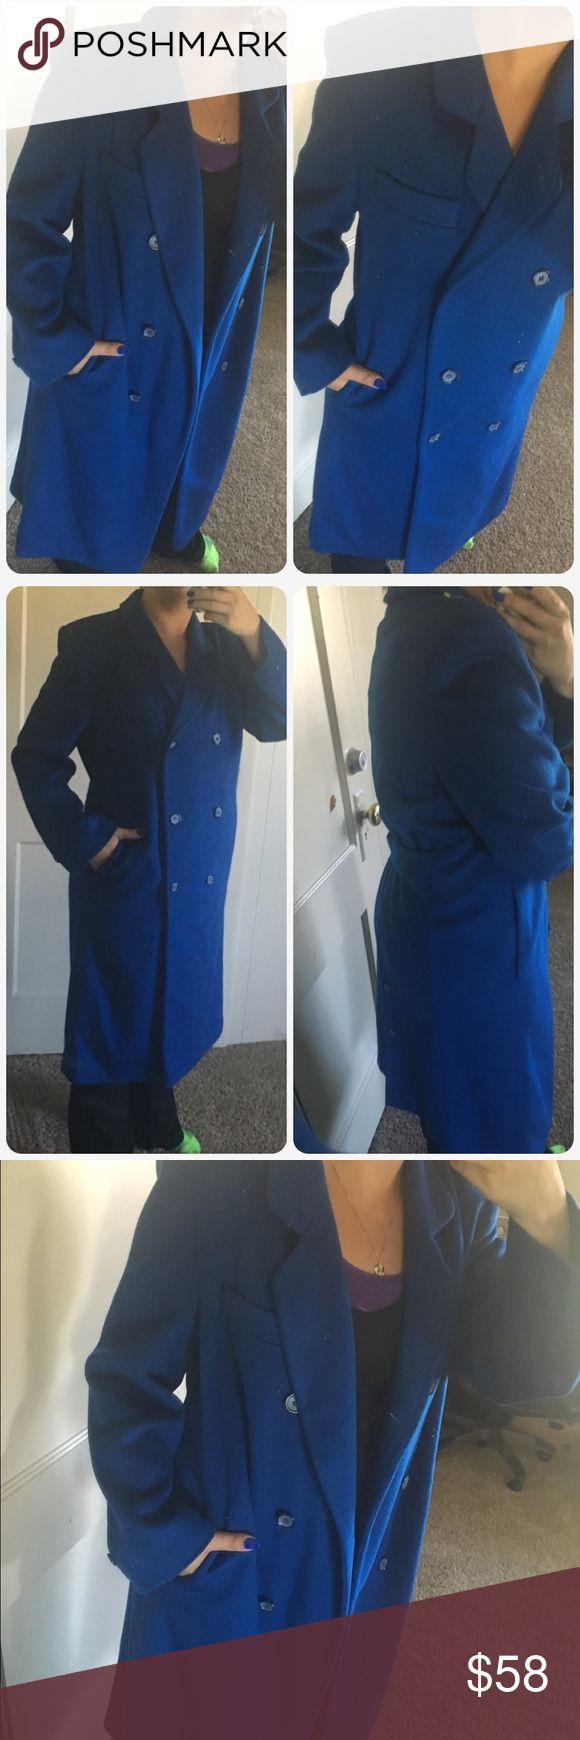 Gorgeous royal blue Ashley Scott petite Like new 100% wool I feel fits closer to a XL Vintage Jackets & Coats Pea Coats